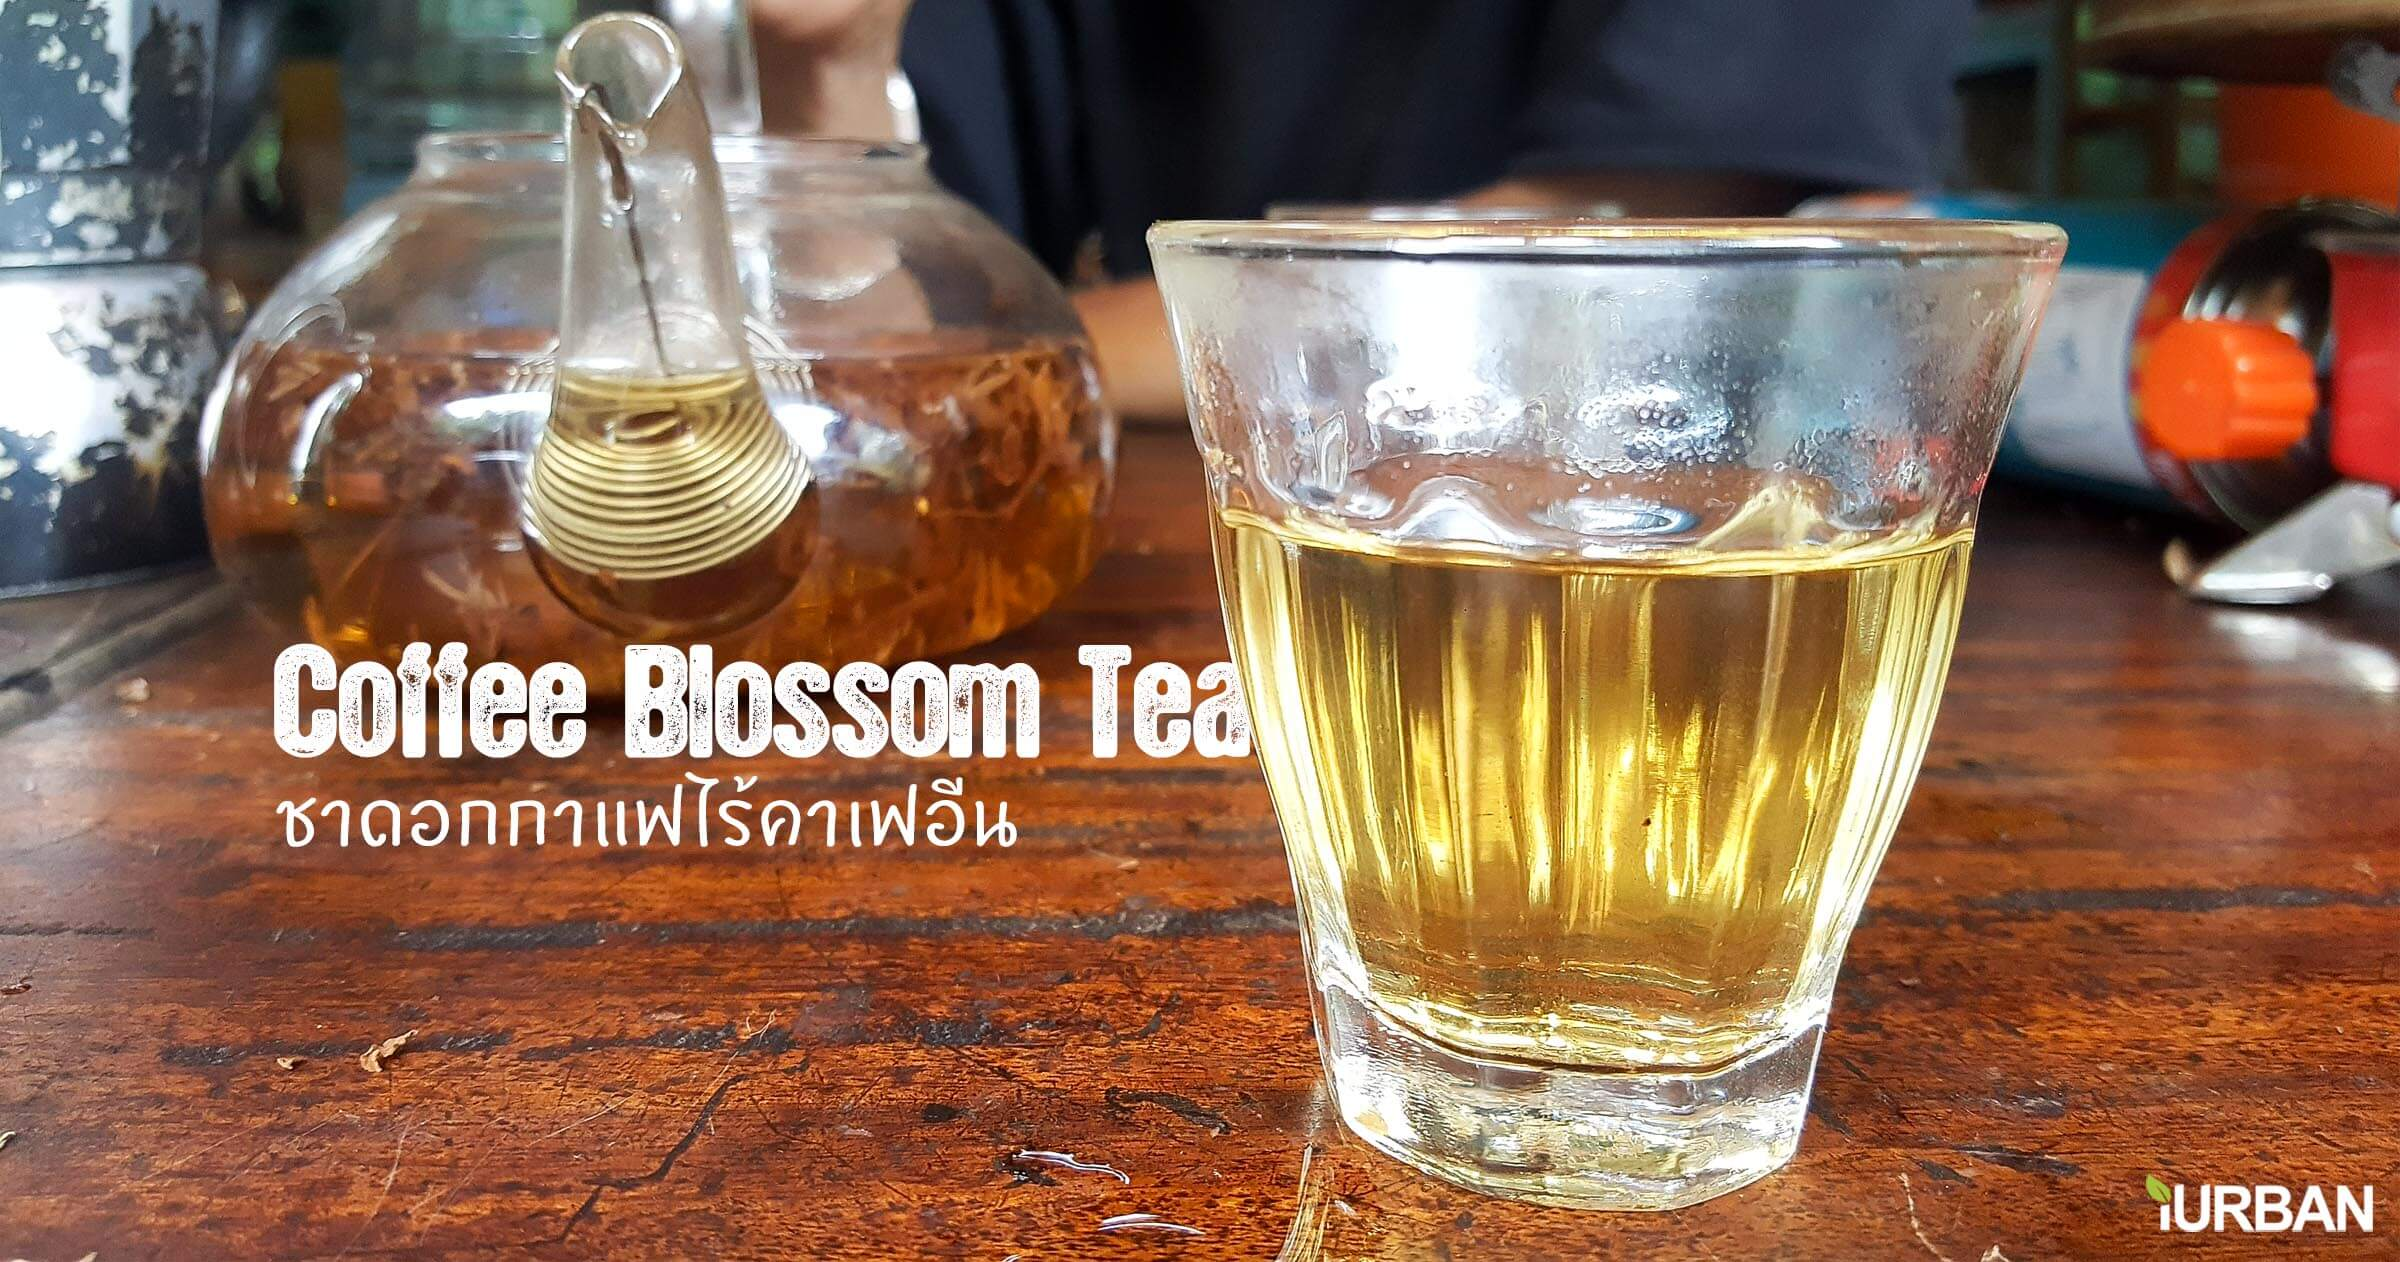 Coffee Blossom tea ชาดอกกาแฟมากประโยชน์ ไร้แทนนินและคาเฟอีน 6 - DIY